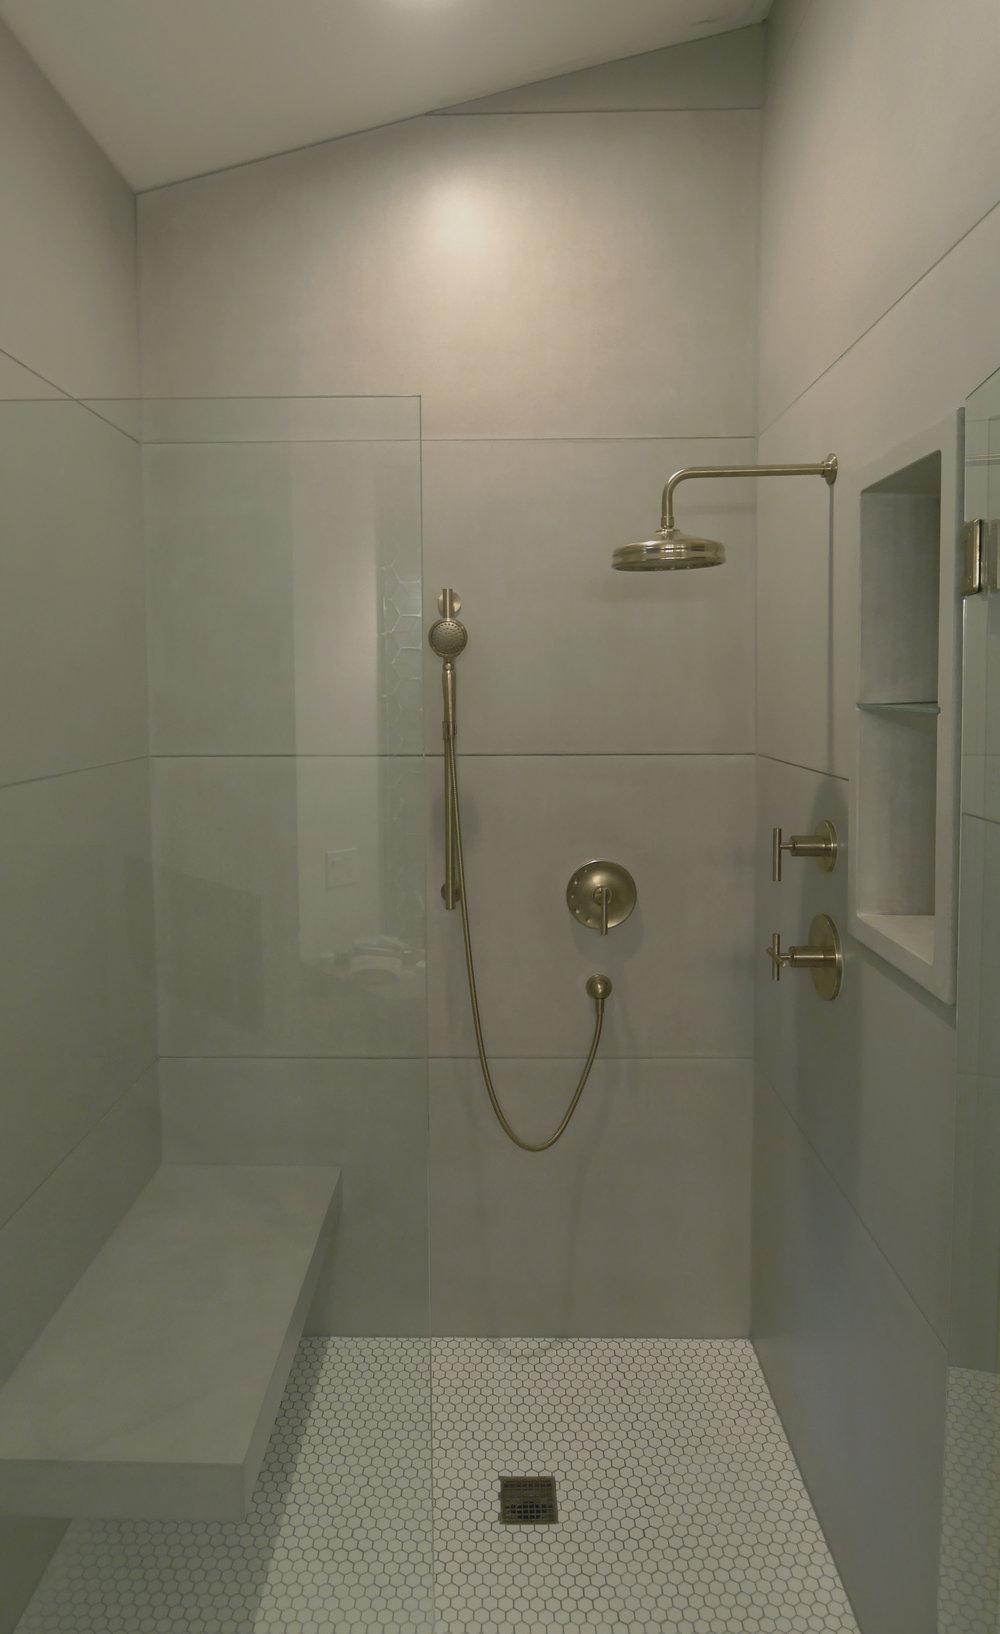 Large Format Concrete Tile Shower with Floating Bench - Copy.jpg